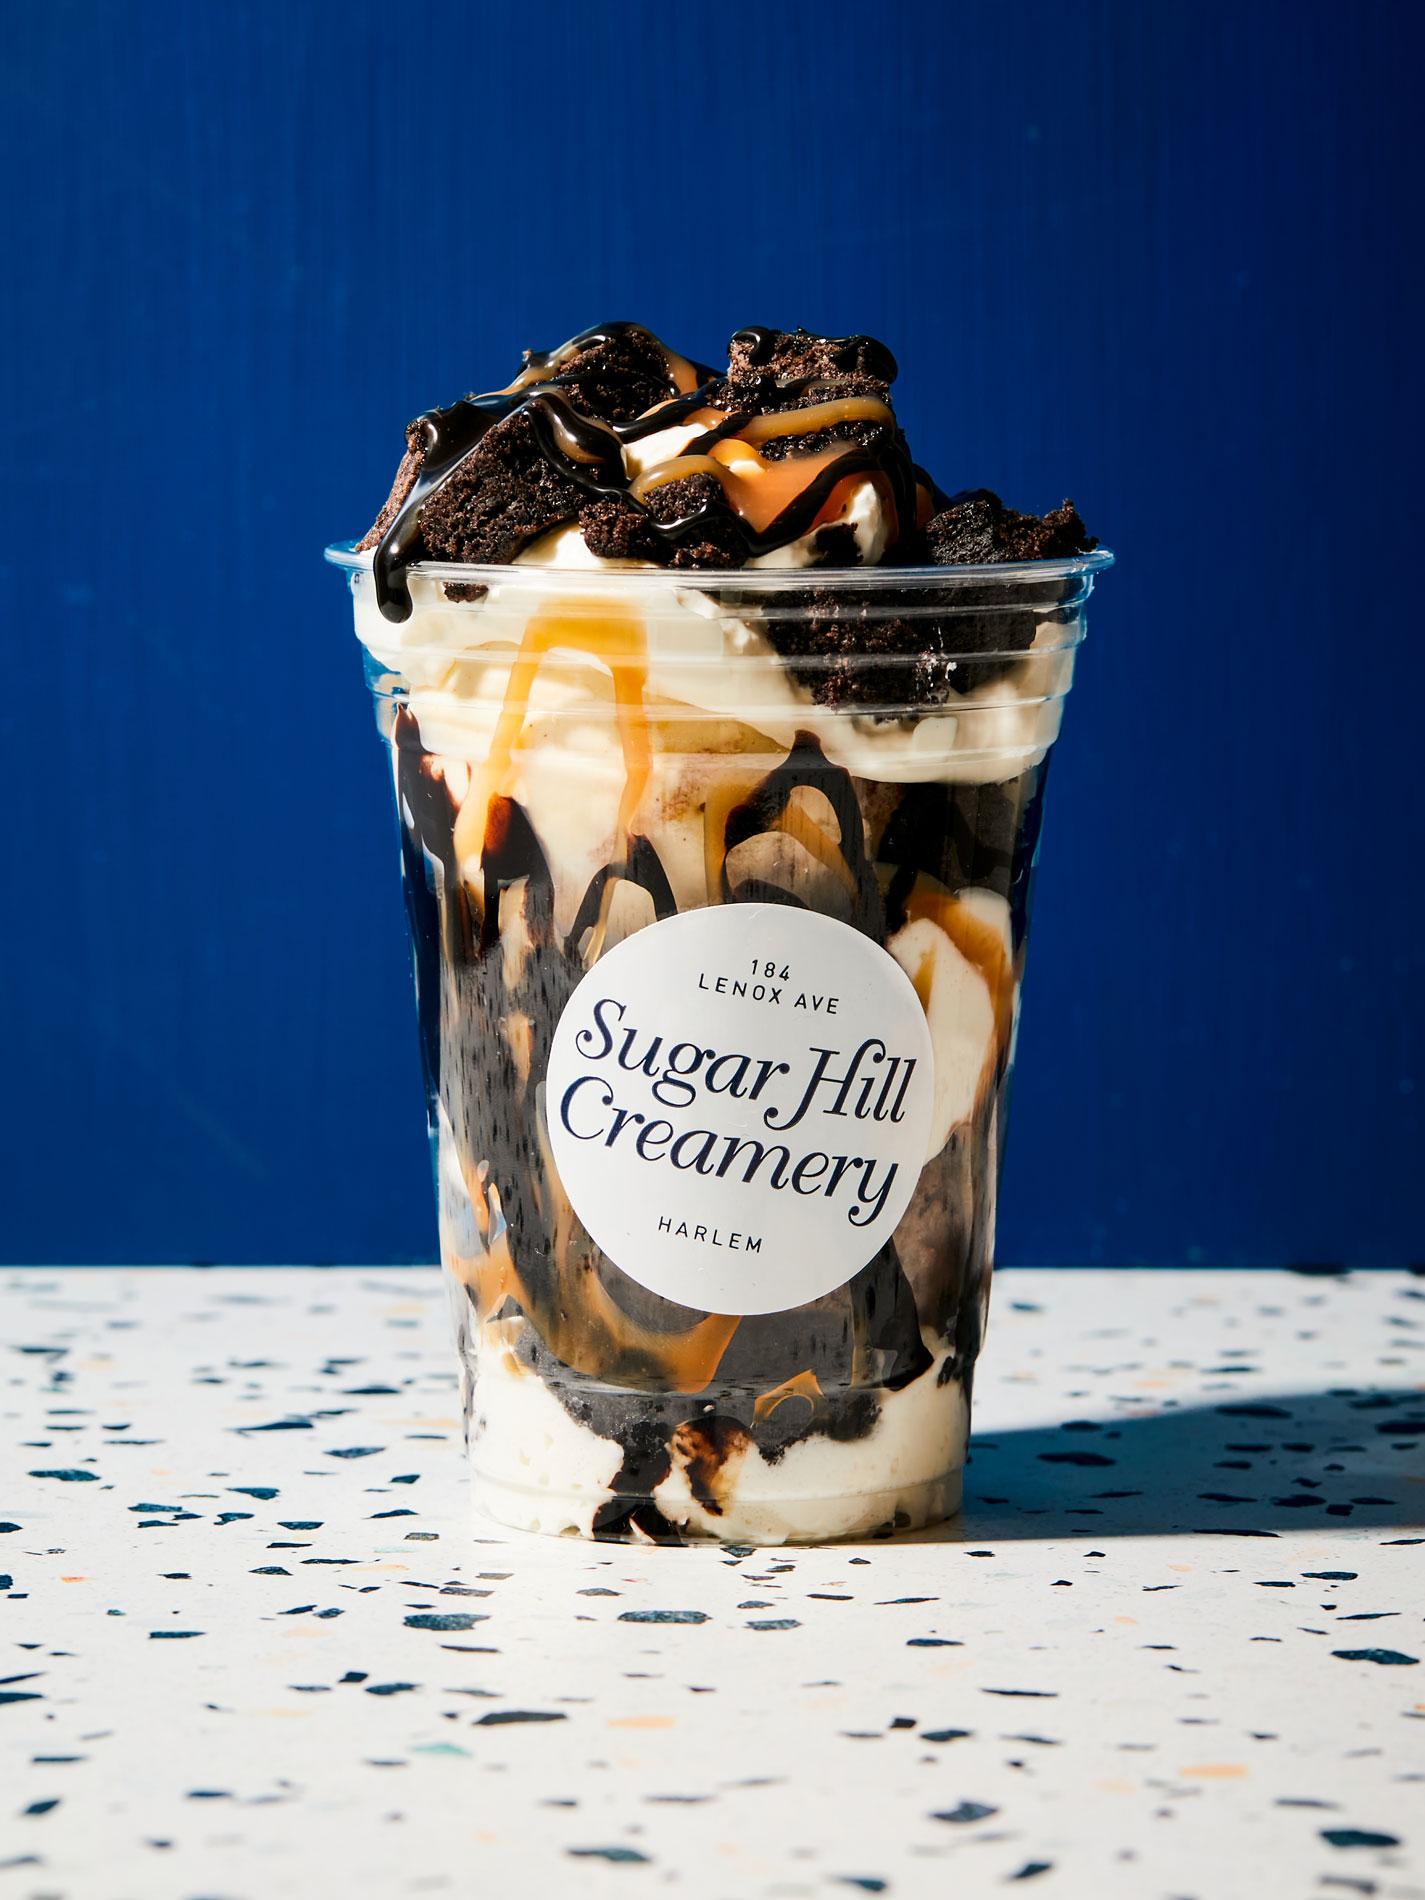 A sundae from Sugar Hill Creamery.